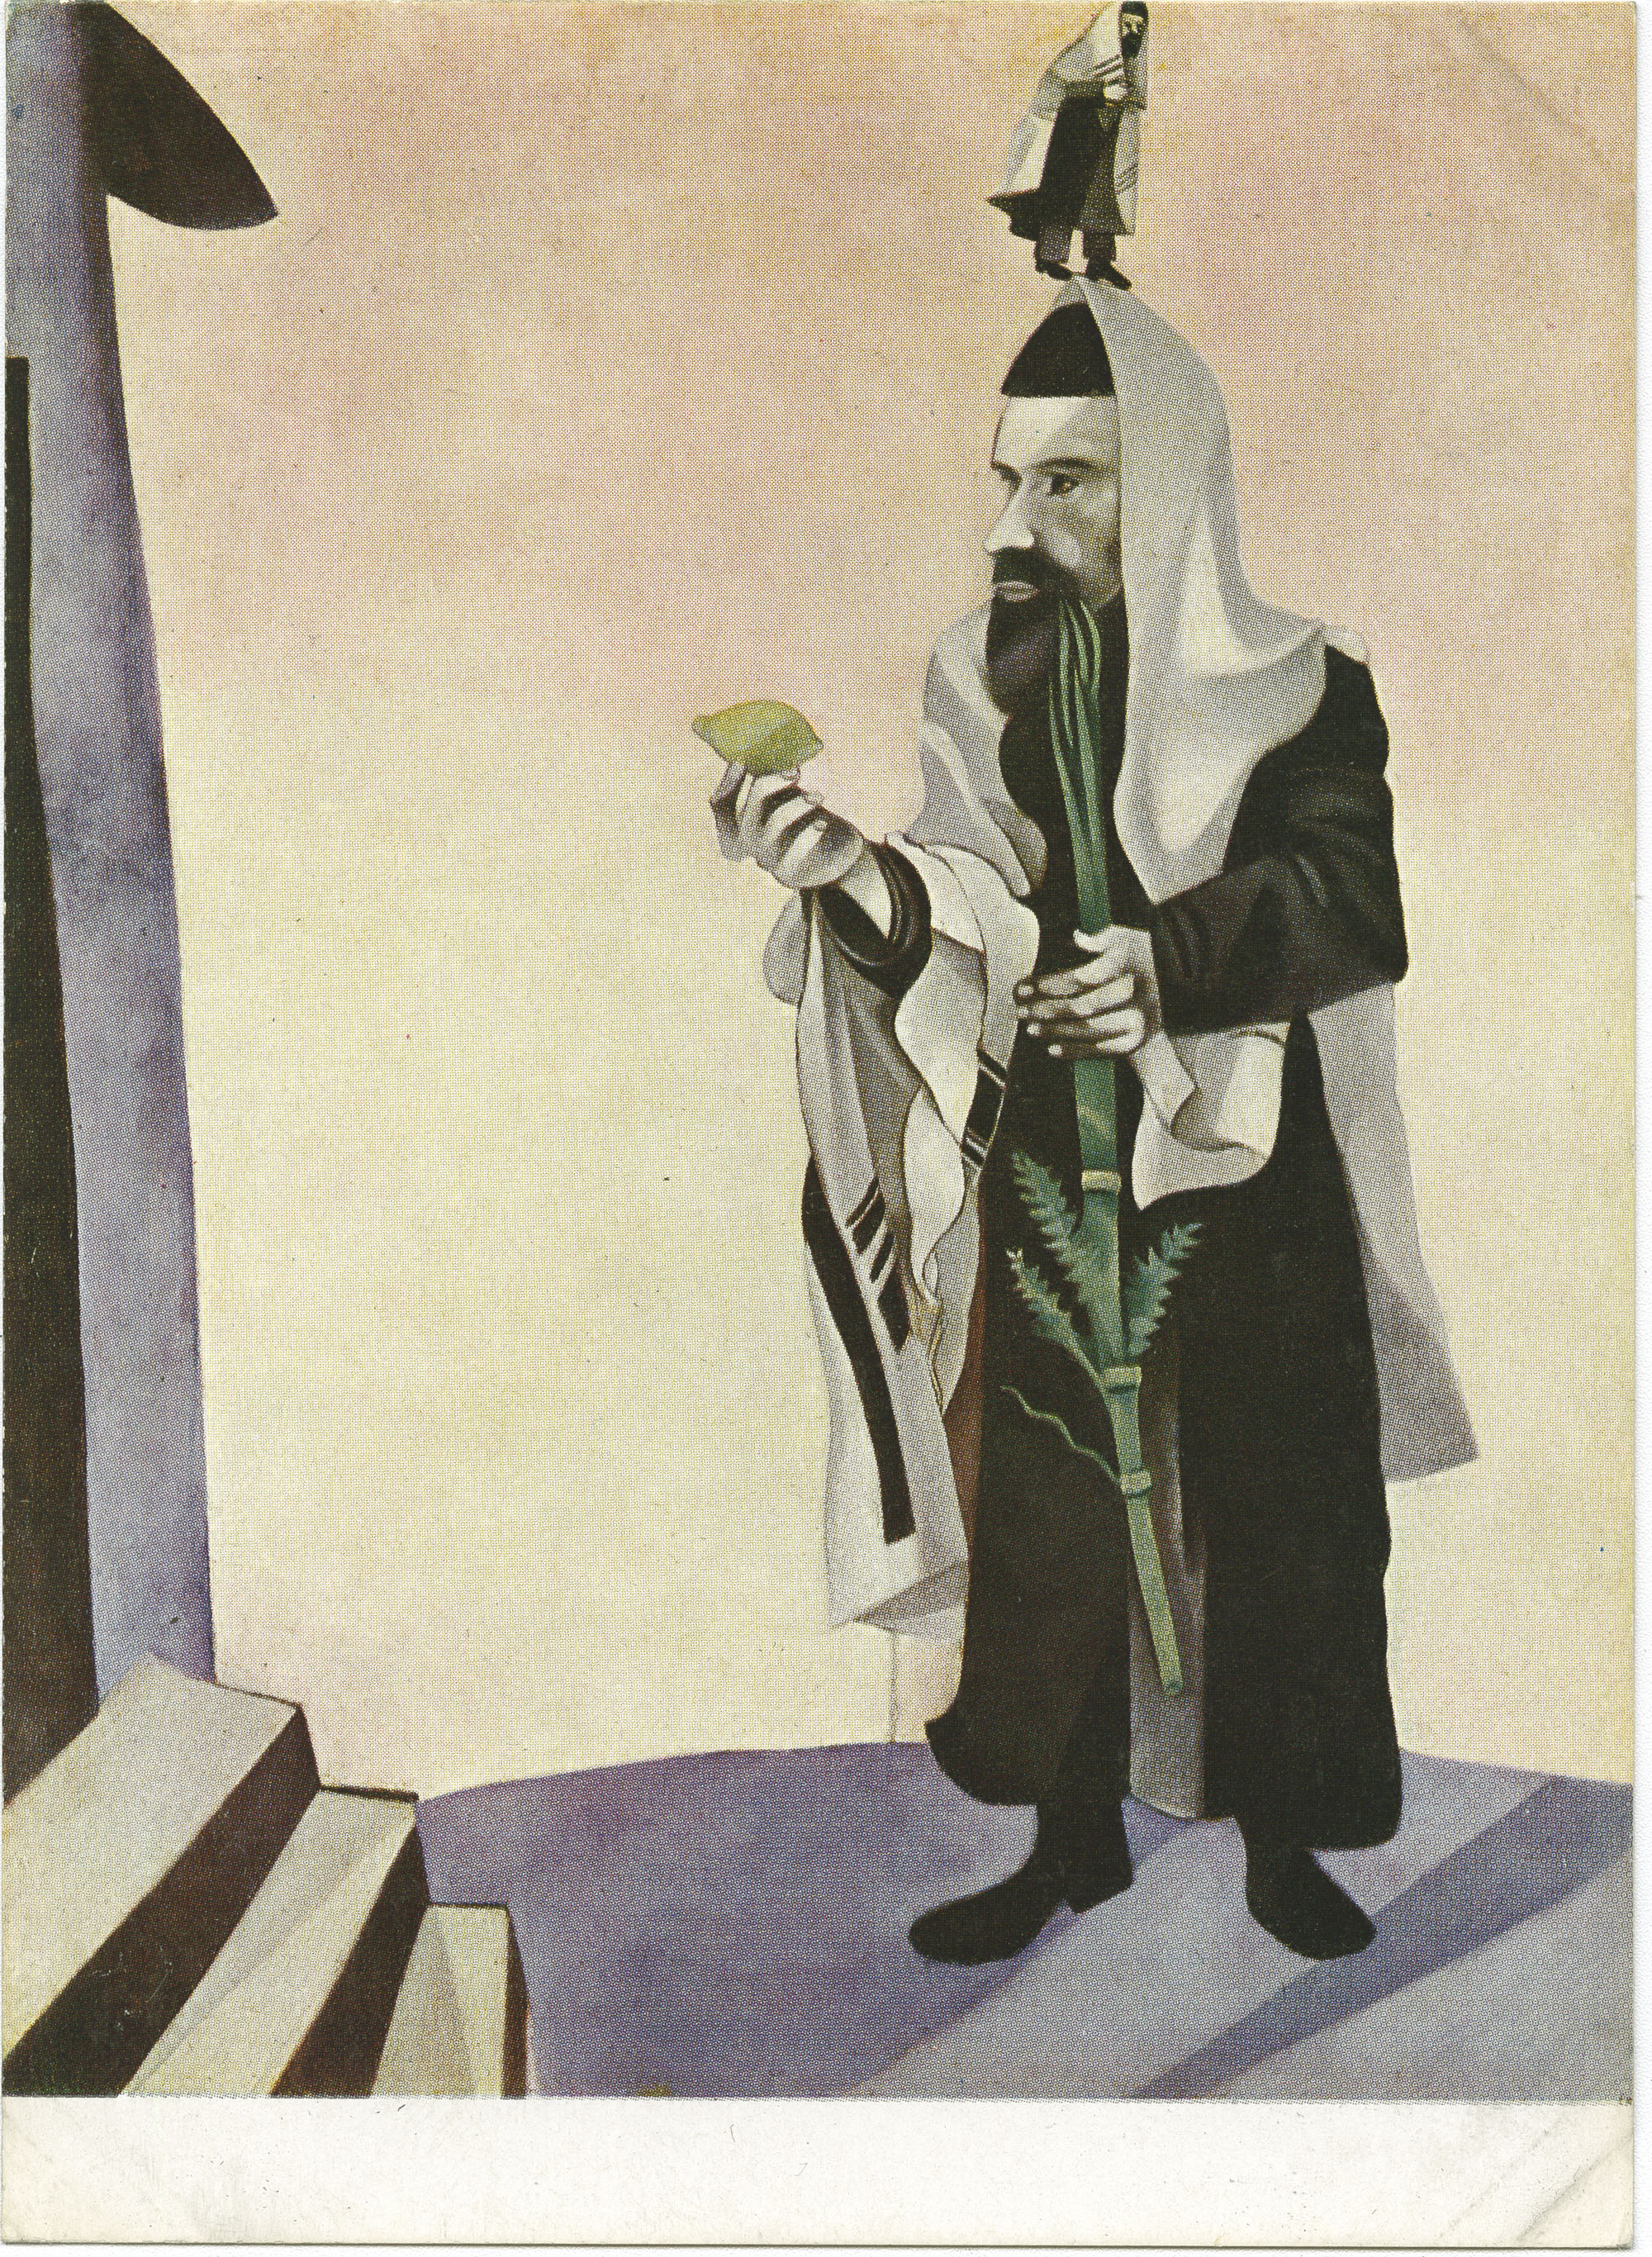 Marc Chagall, geb. 1887. Festtag (Rabbiner mit Zitrone), 1914.